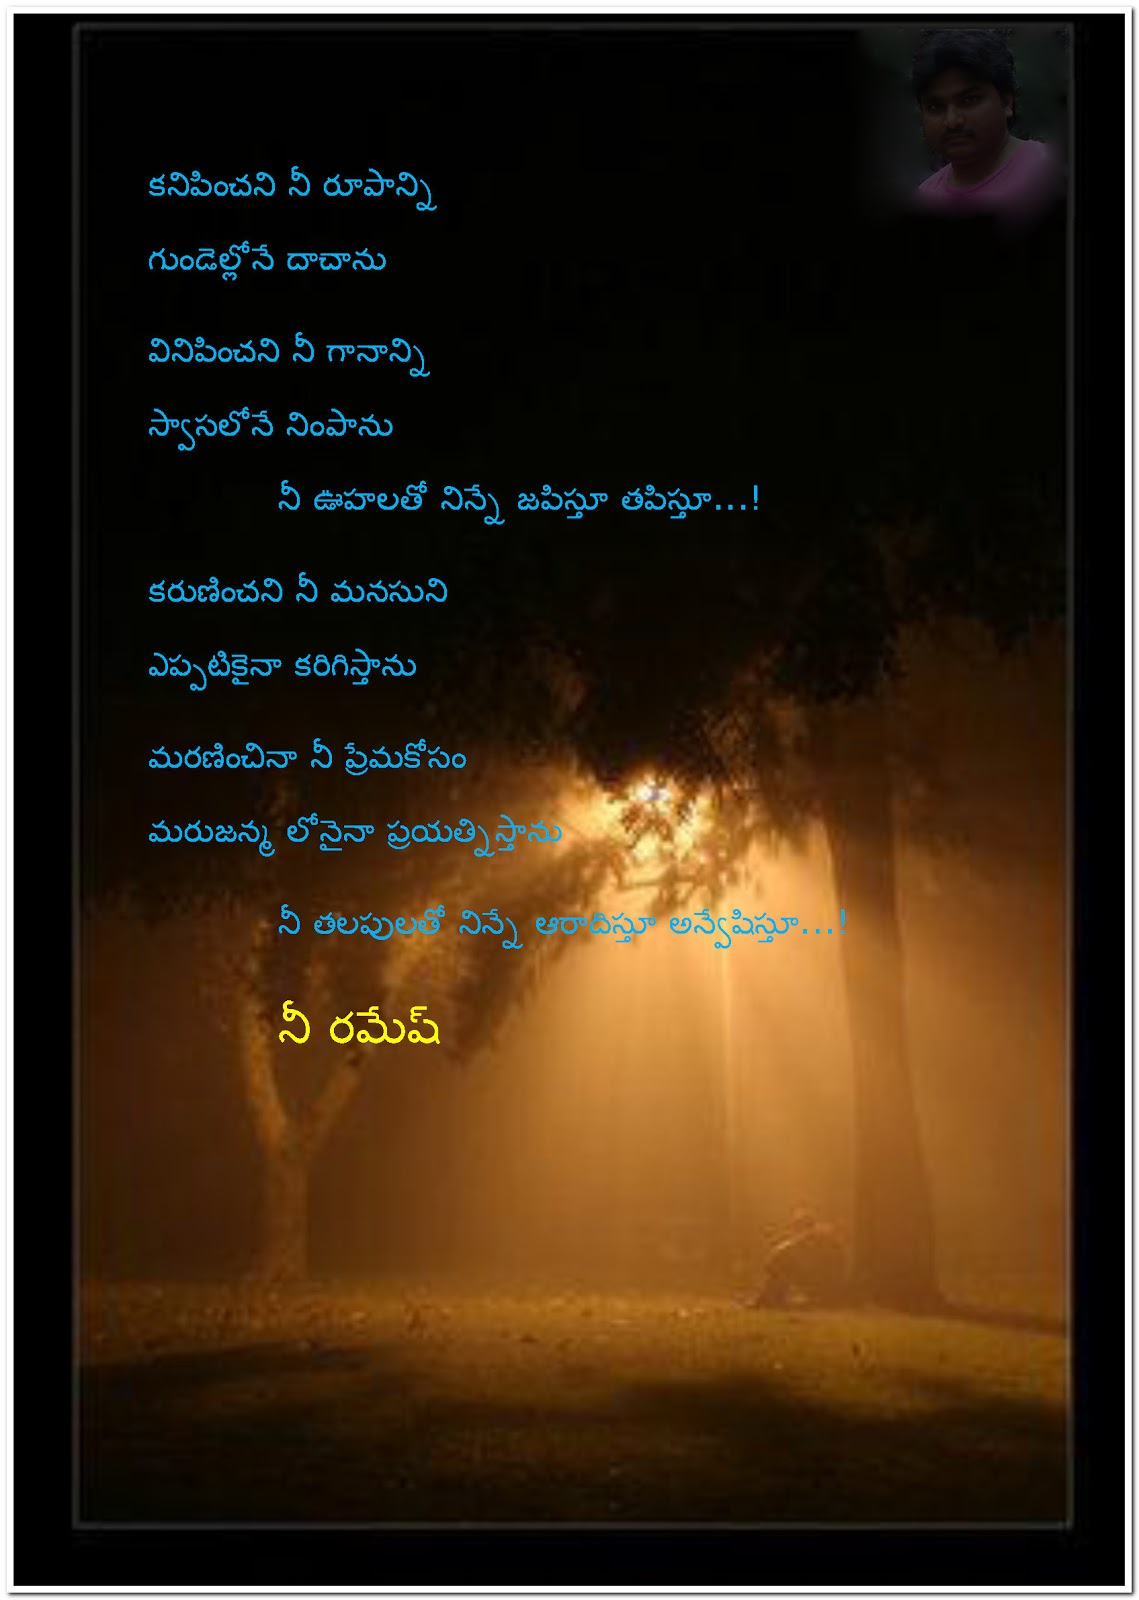 Telugu Kavithalu: Best Love Poems (Naa Prema Kavithalu)